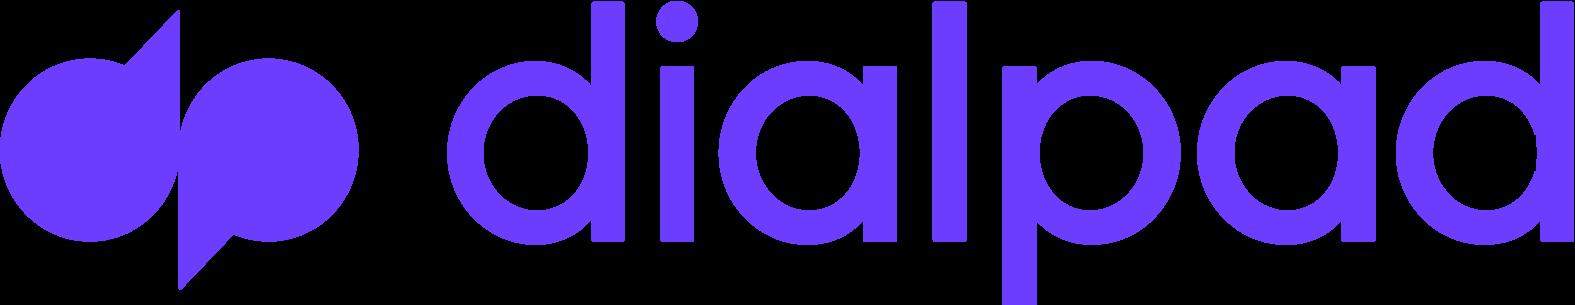 With New Partner Portal, Dialpad's Channel Driven Sales Soar